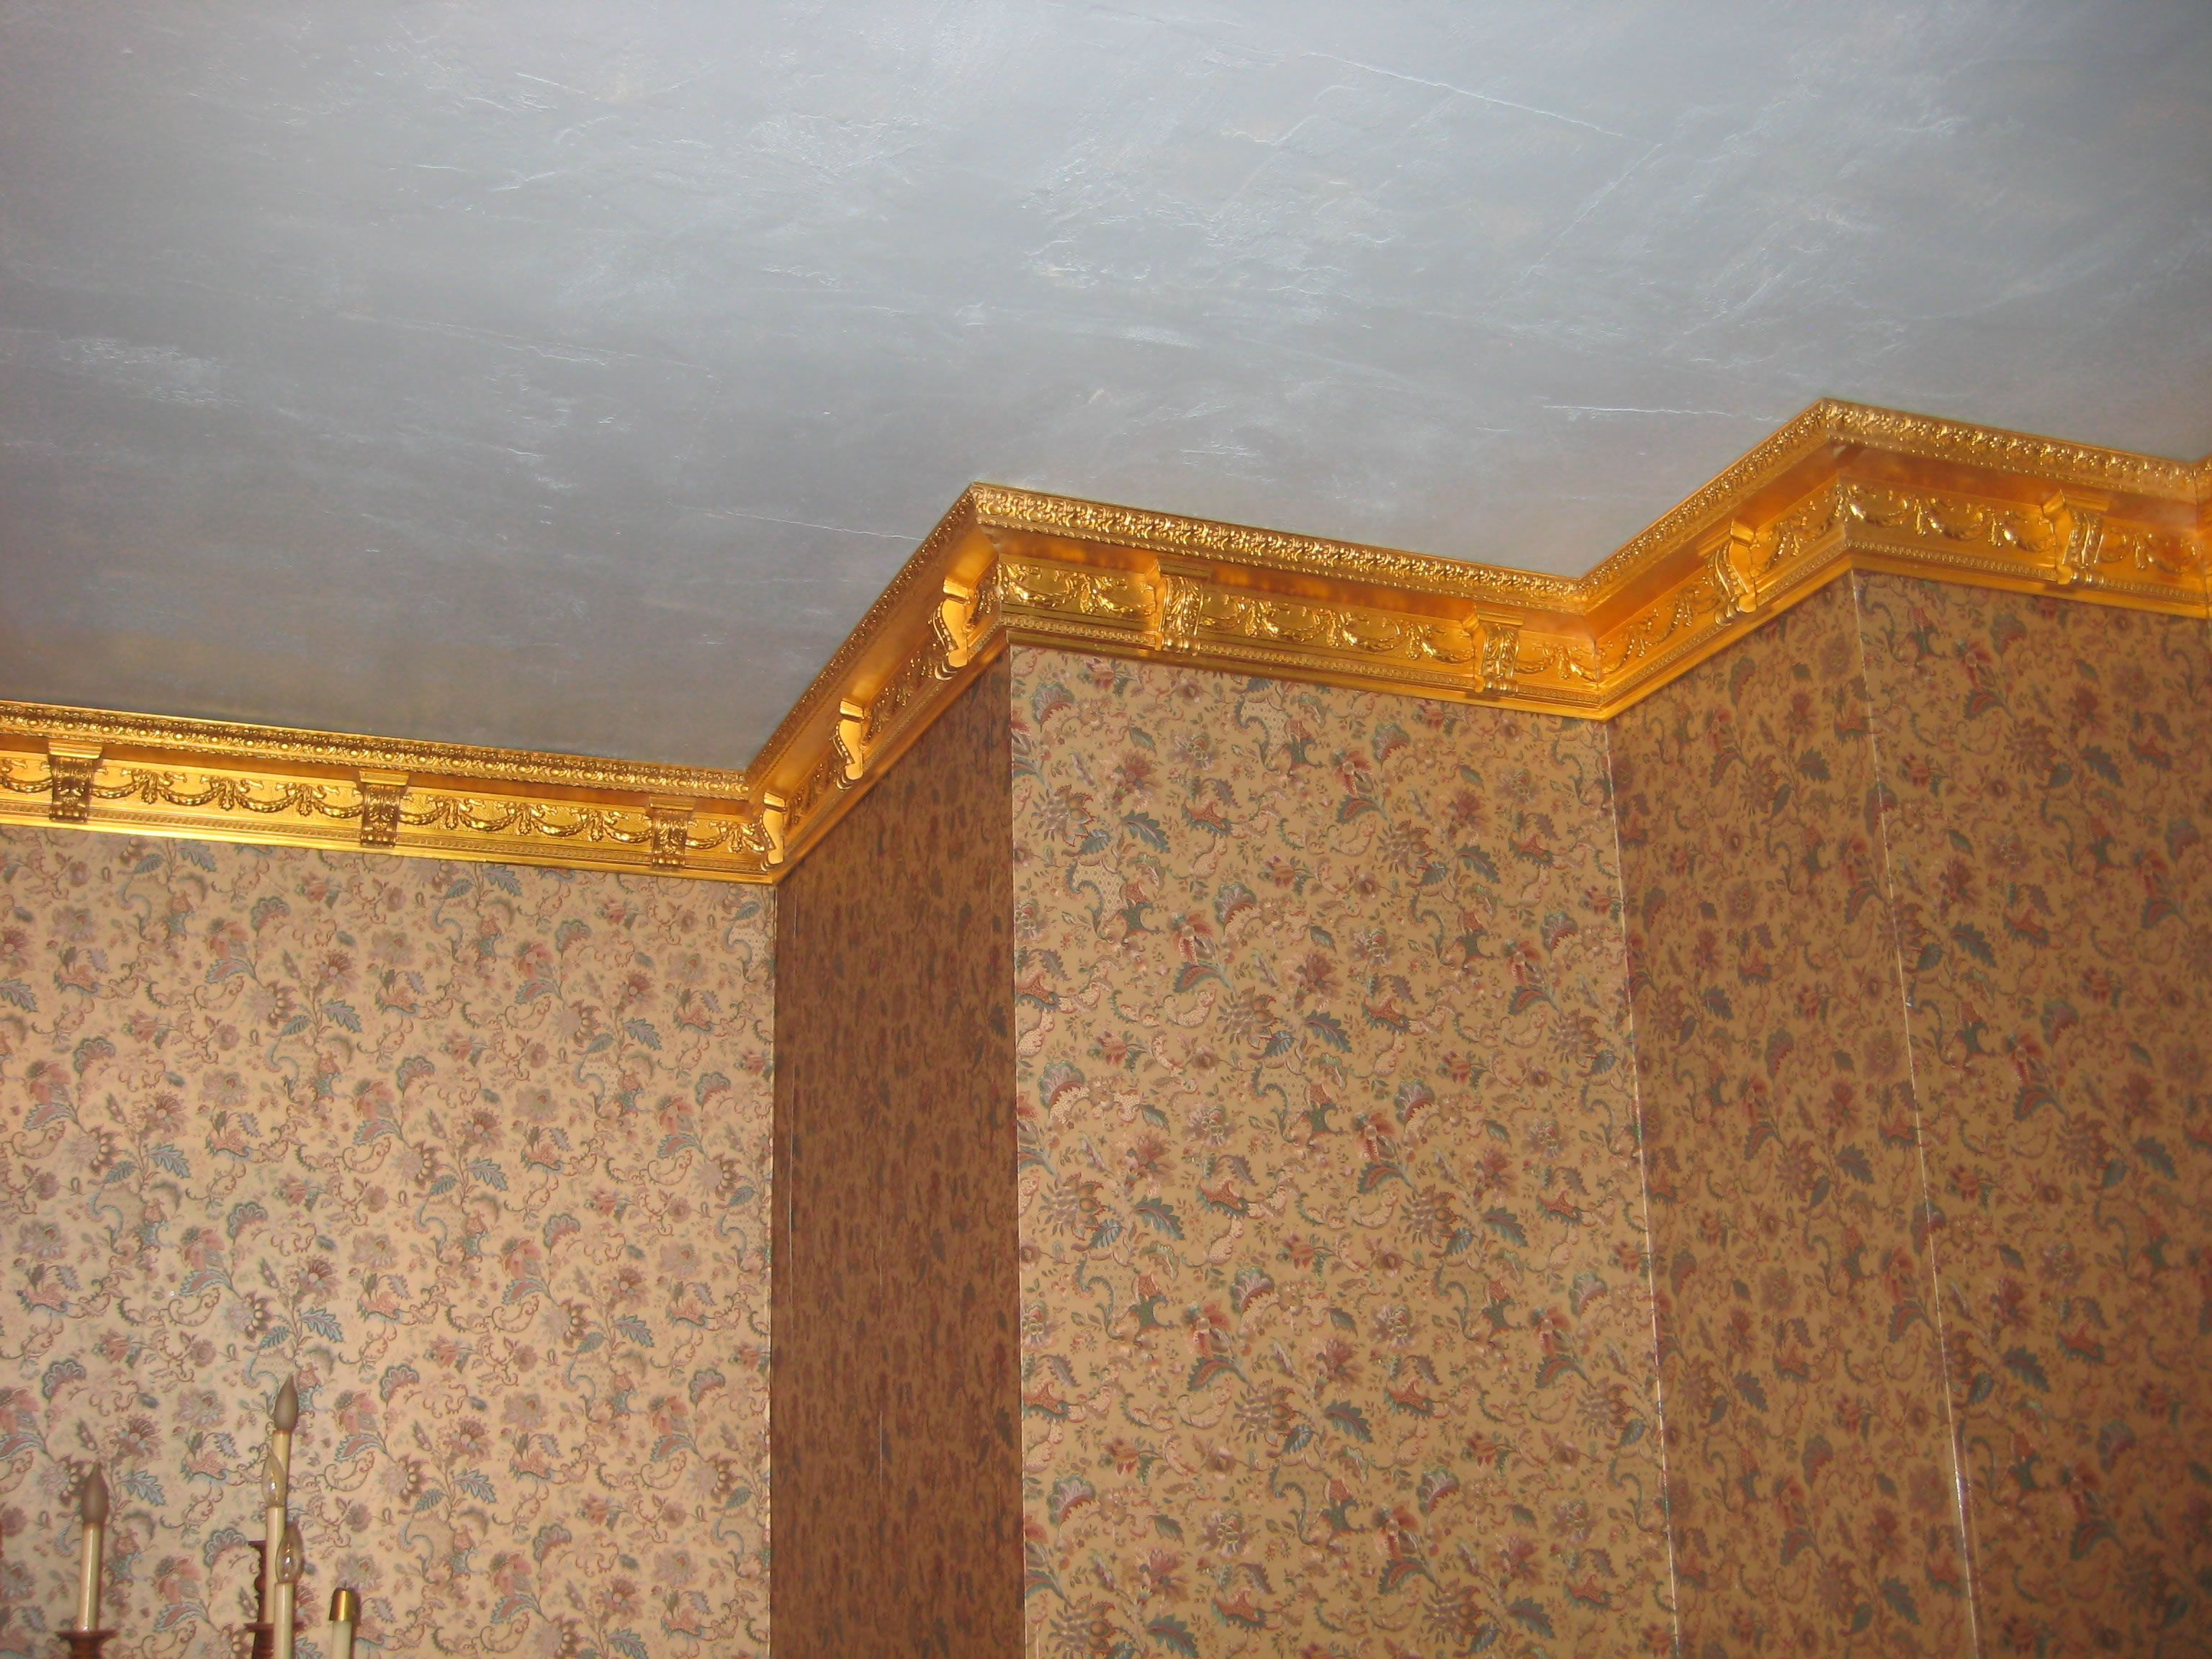 Golden Elaborate Crown Molding Crown Molding Elaborate Crown